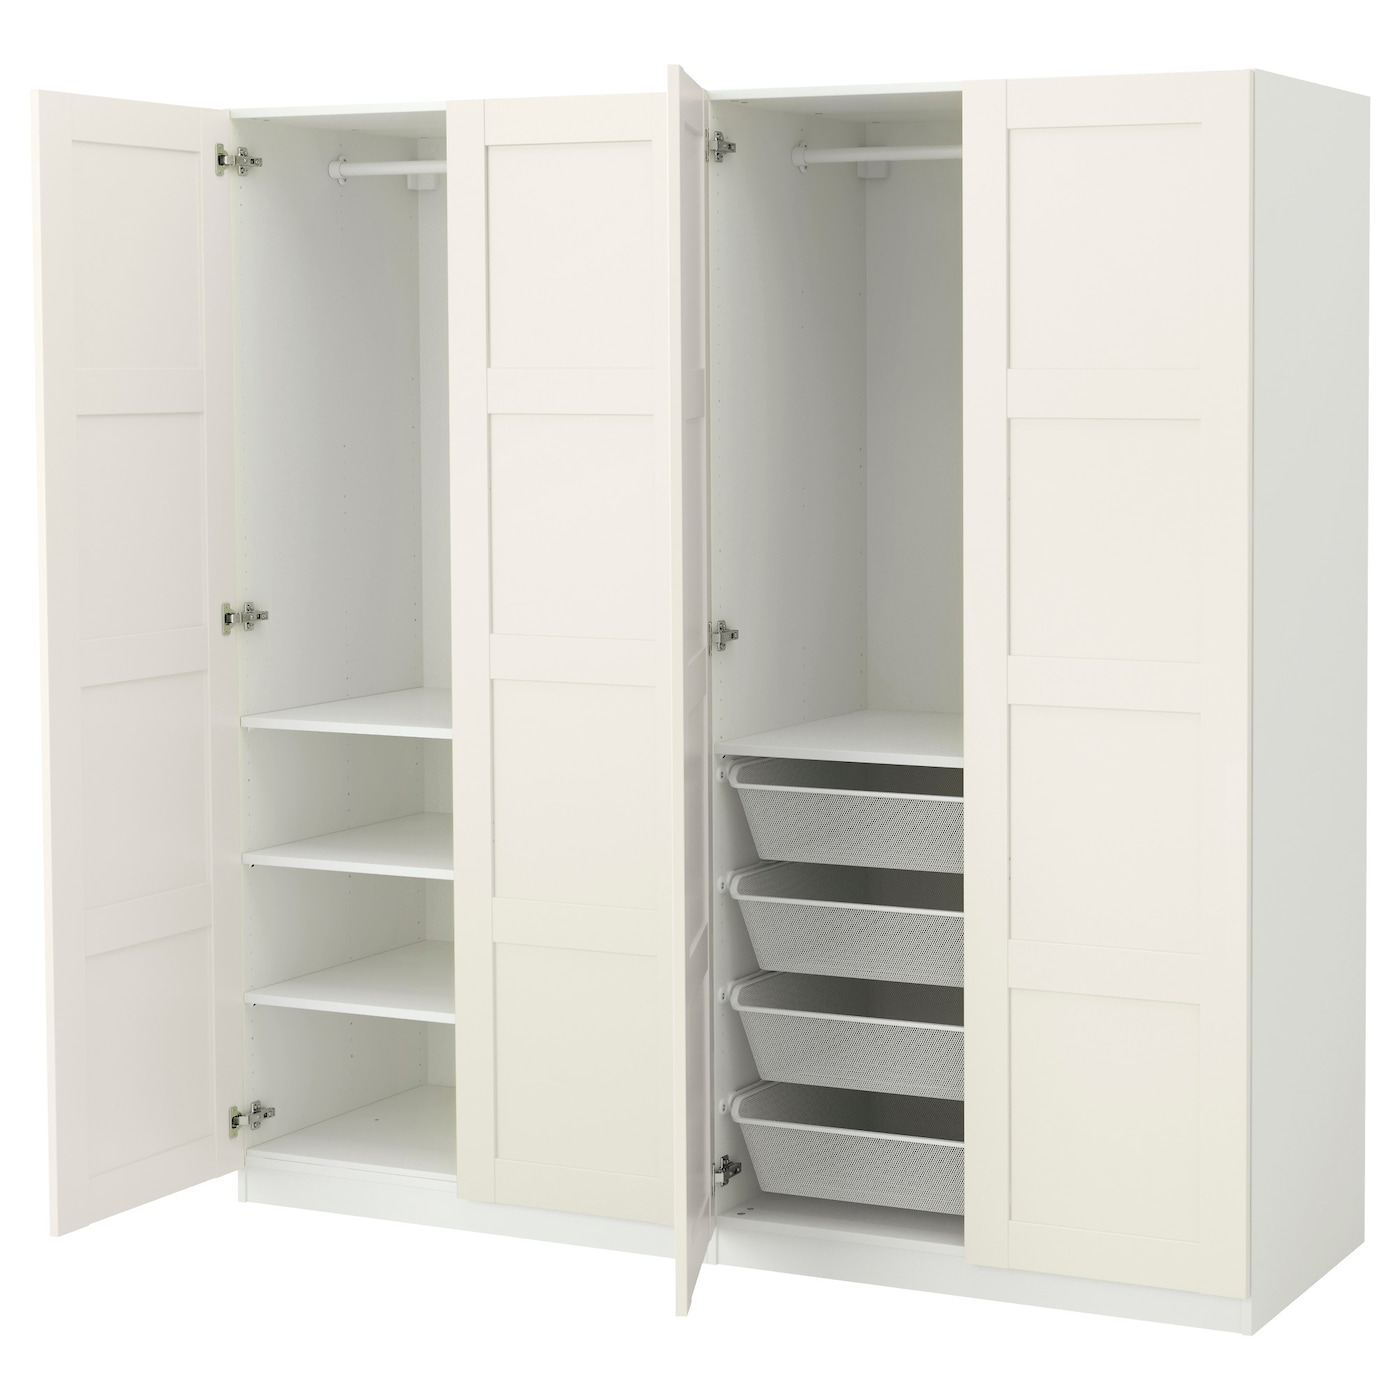 pax wardrobe white bergsbo white 200 x 60 x 201 cm ikea. Black Bedroom Furniture Sets. Home Design Ideas